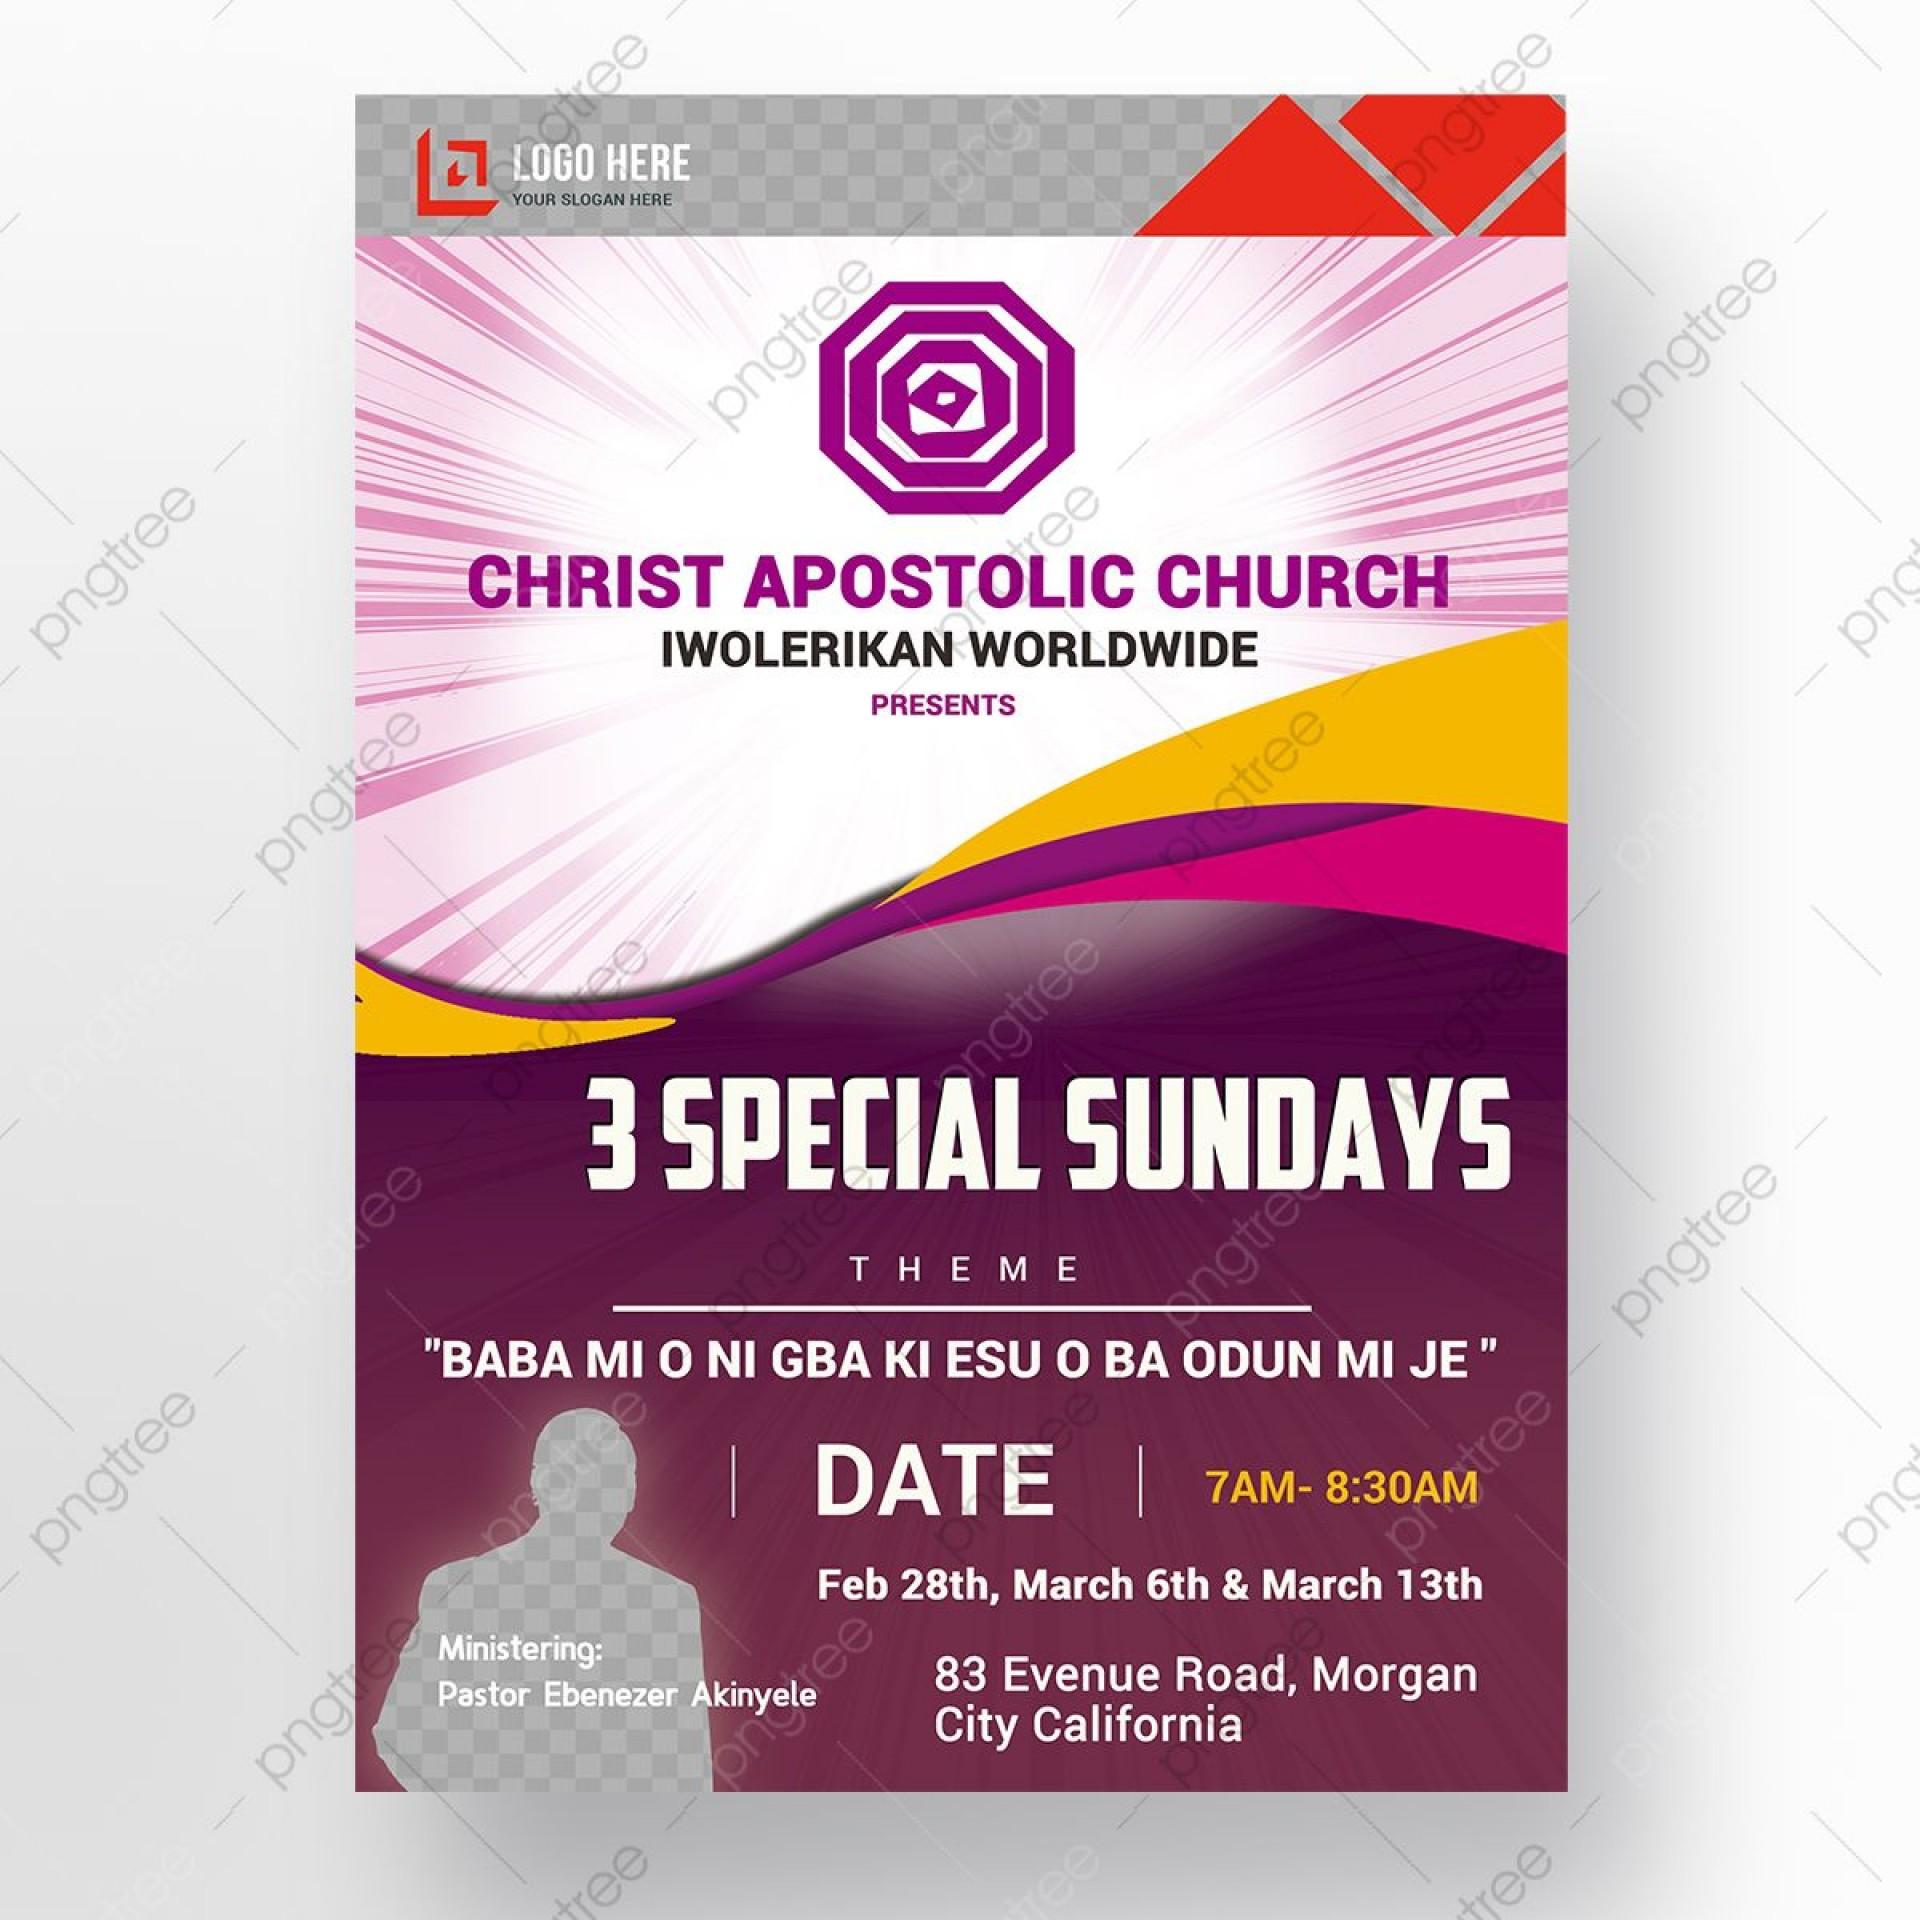 009 Wondrou Church Flyer Template Photoshop Free Picture  Psd1920